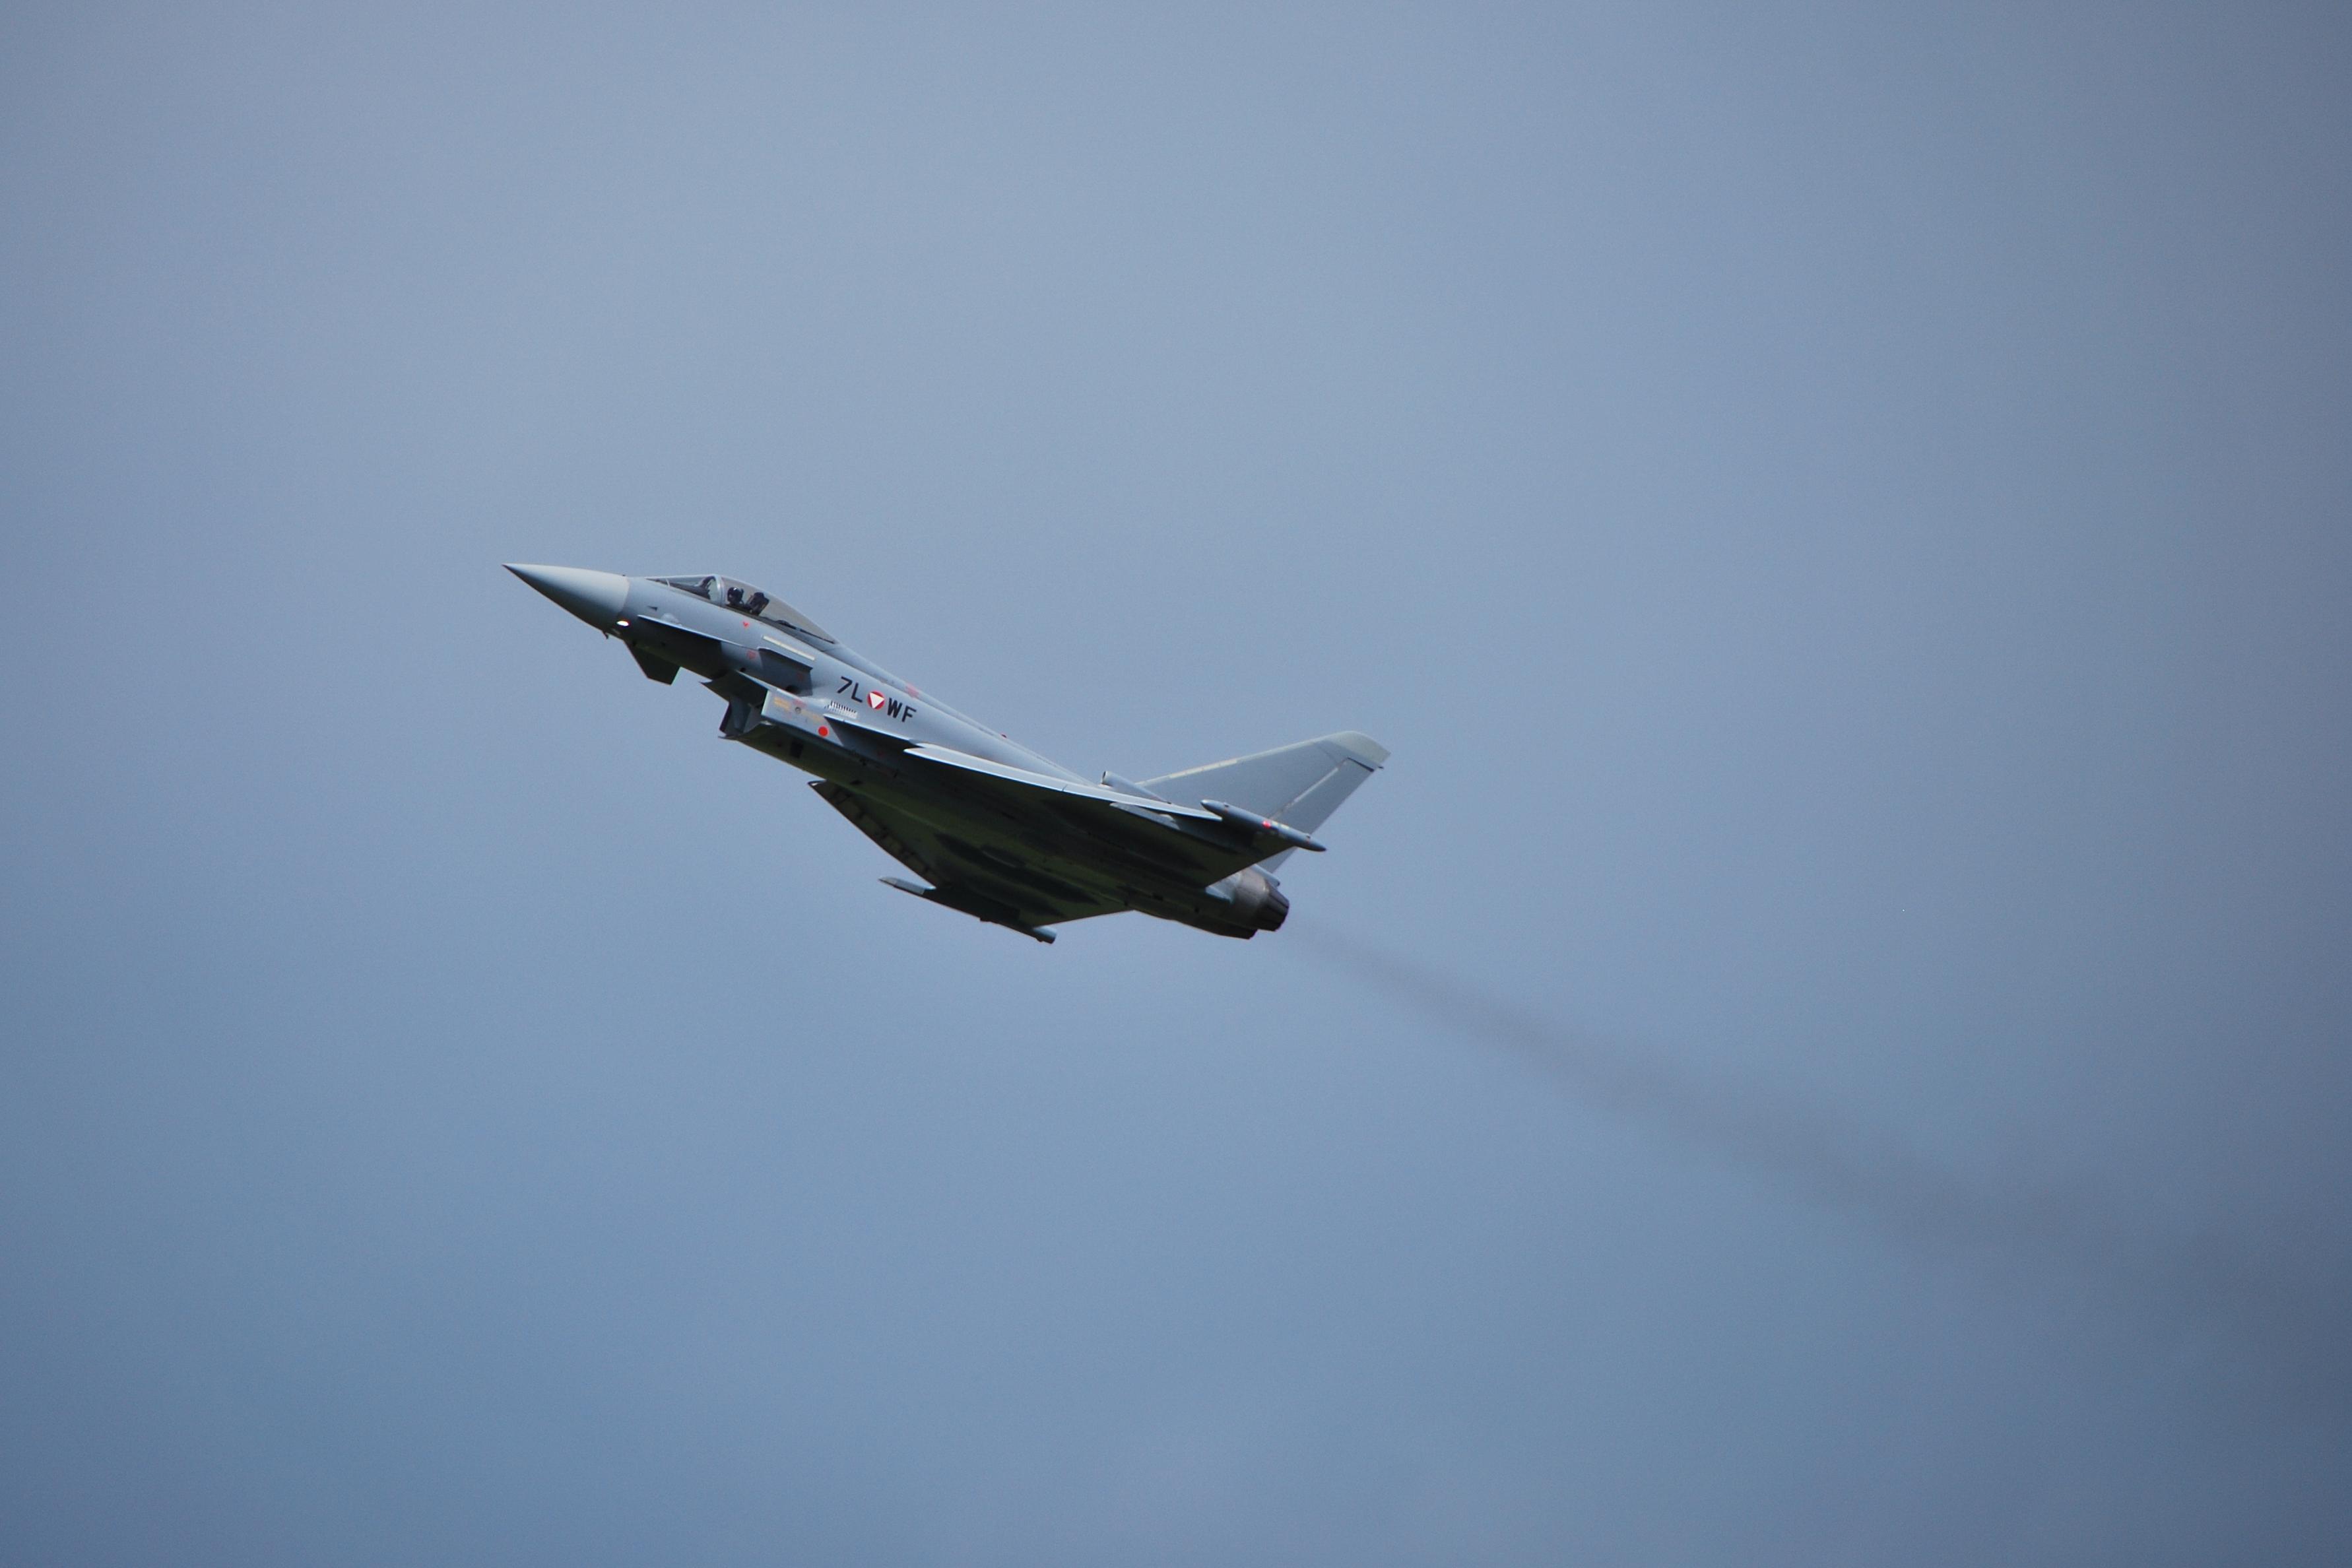 Free Images : war, combat, technology, flight, plane